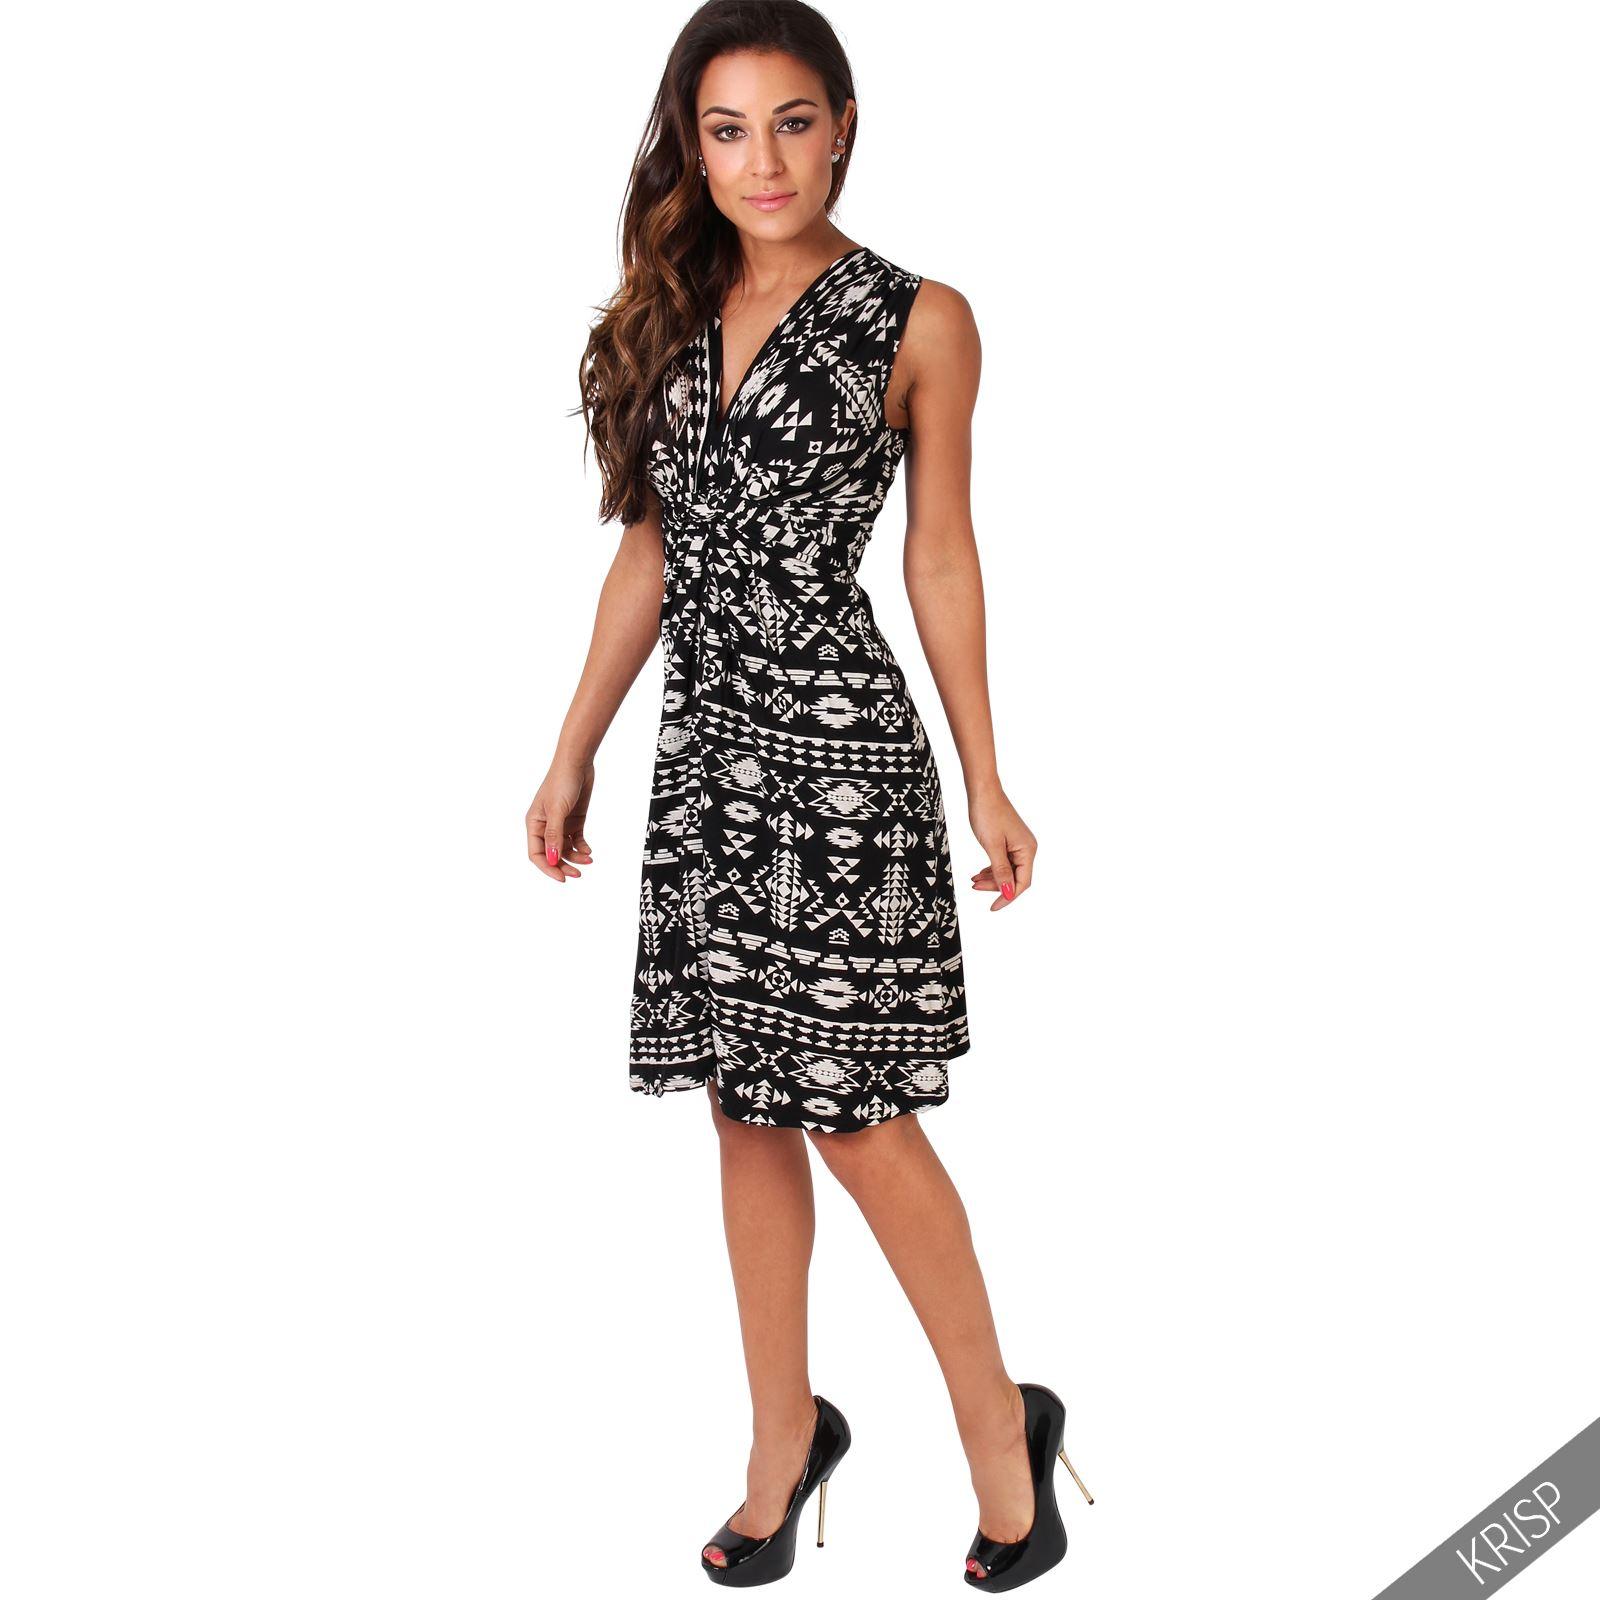 Womens-V-Neck-Mini-Dress-Small-Sizes-Short-Skirt-Tribal-Print-Front-Knot-Party thumbnail 16